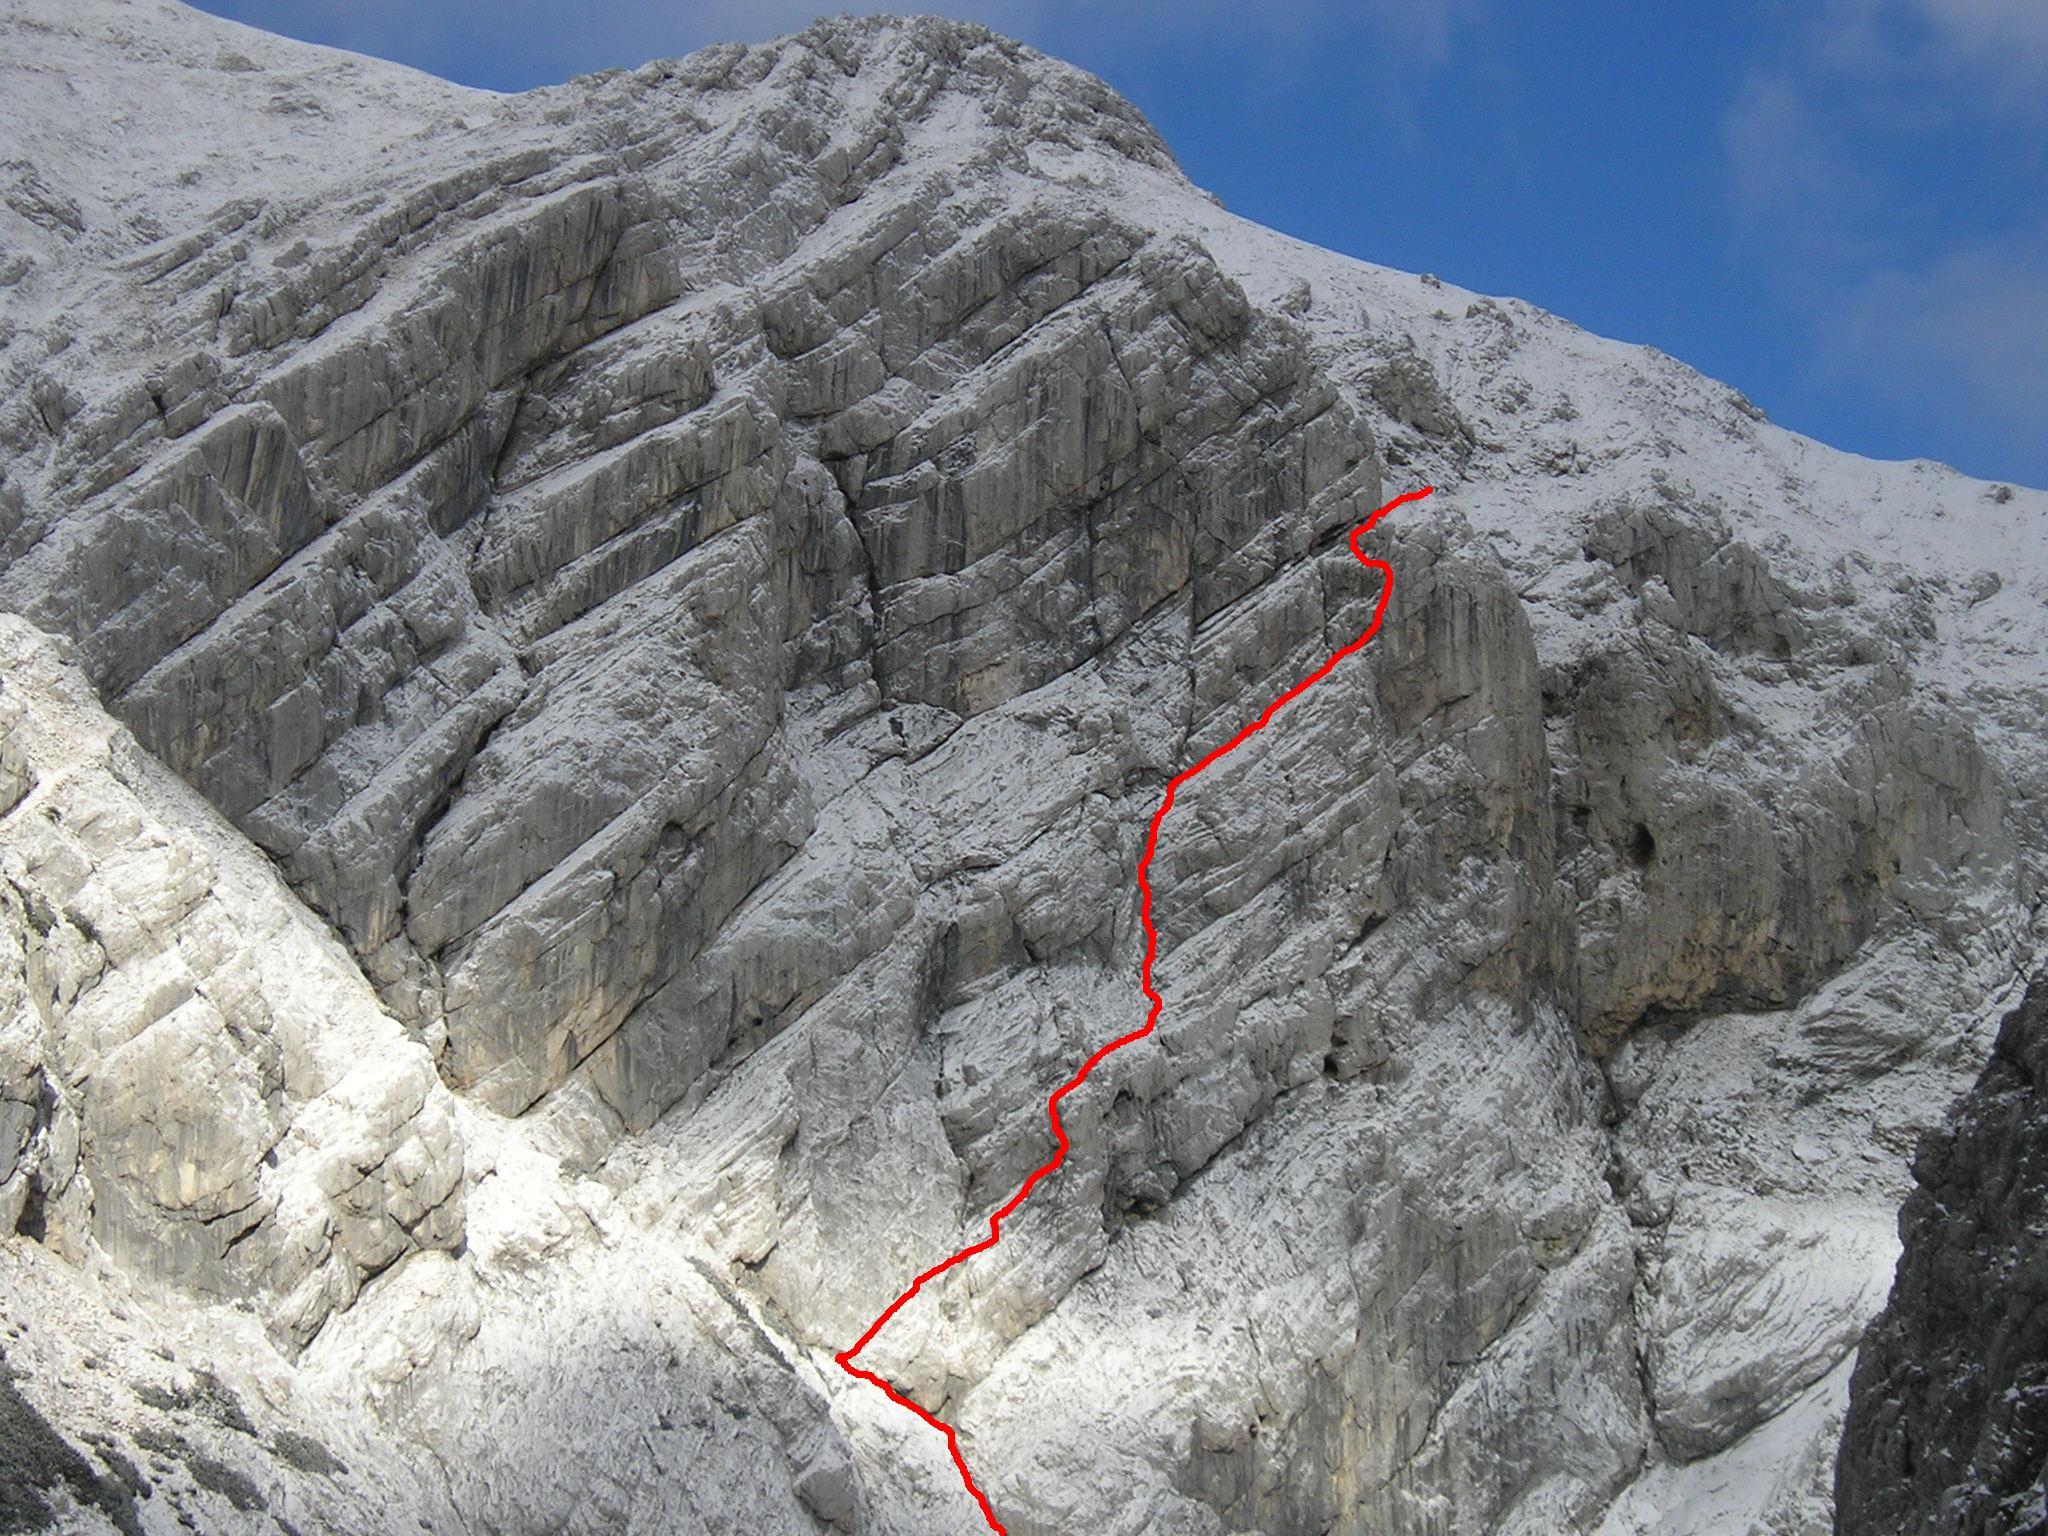 20130706-grs-intervencija-zaplezana_alpinista-jv_stena_planjave_03